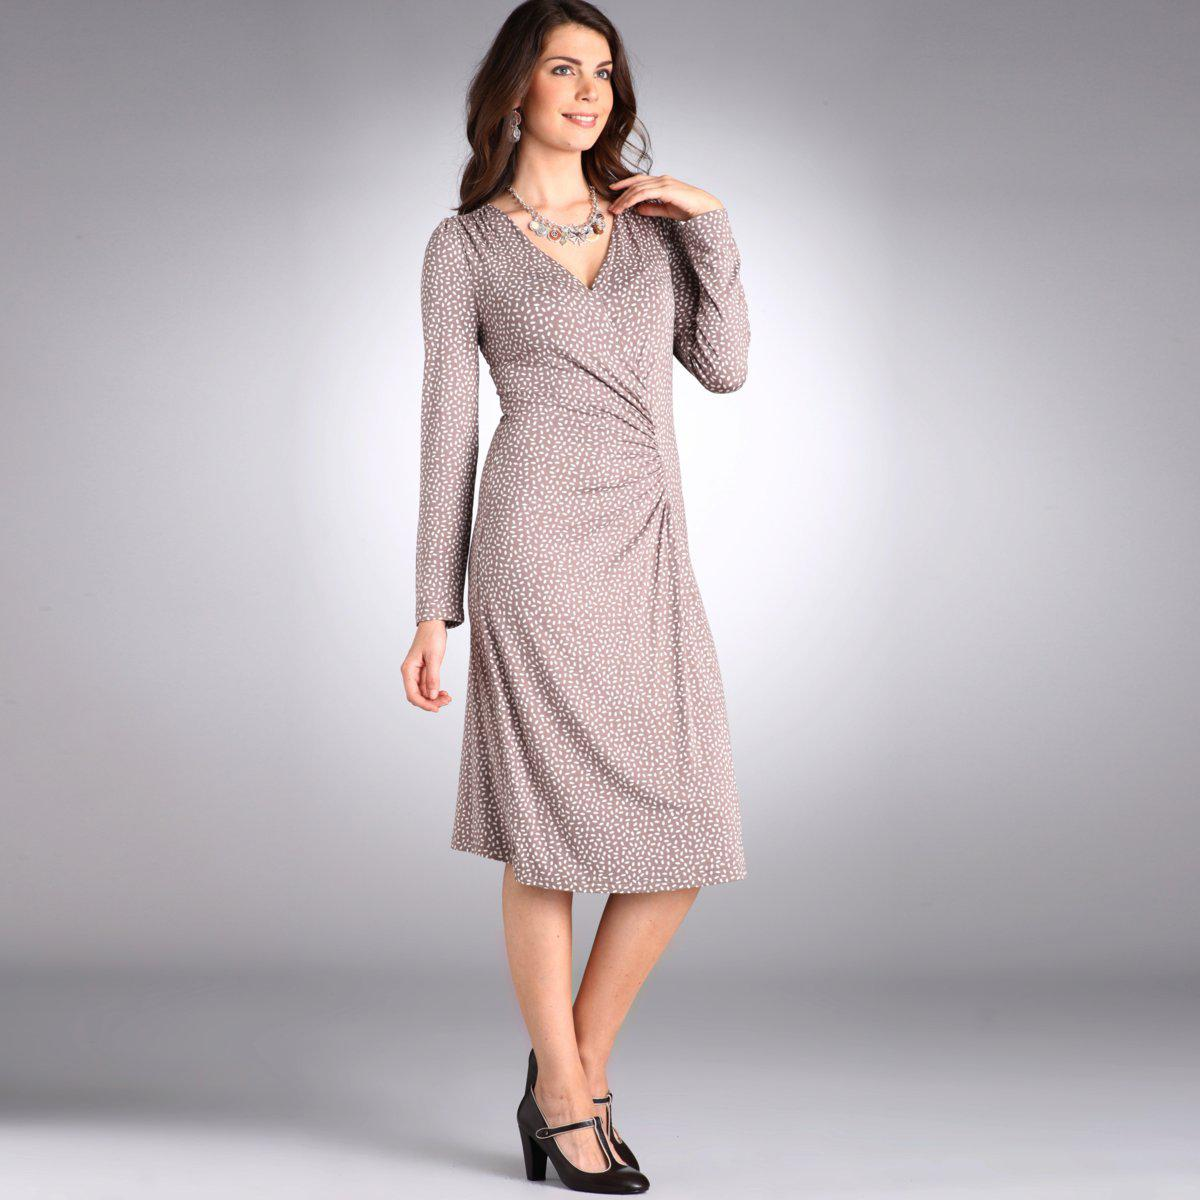 2e236bbe48d0 Βραδυνα Φορεματα LaRedoute Φθινόπωρο 2011 Κωδ. 324206837